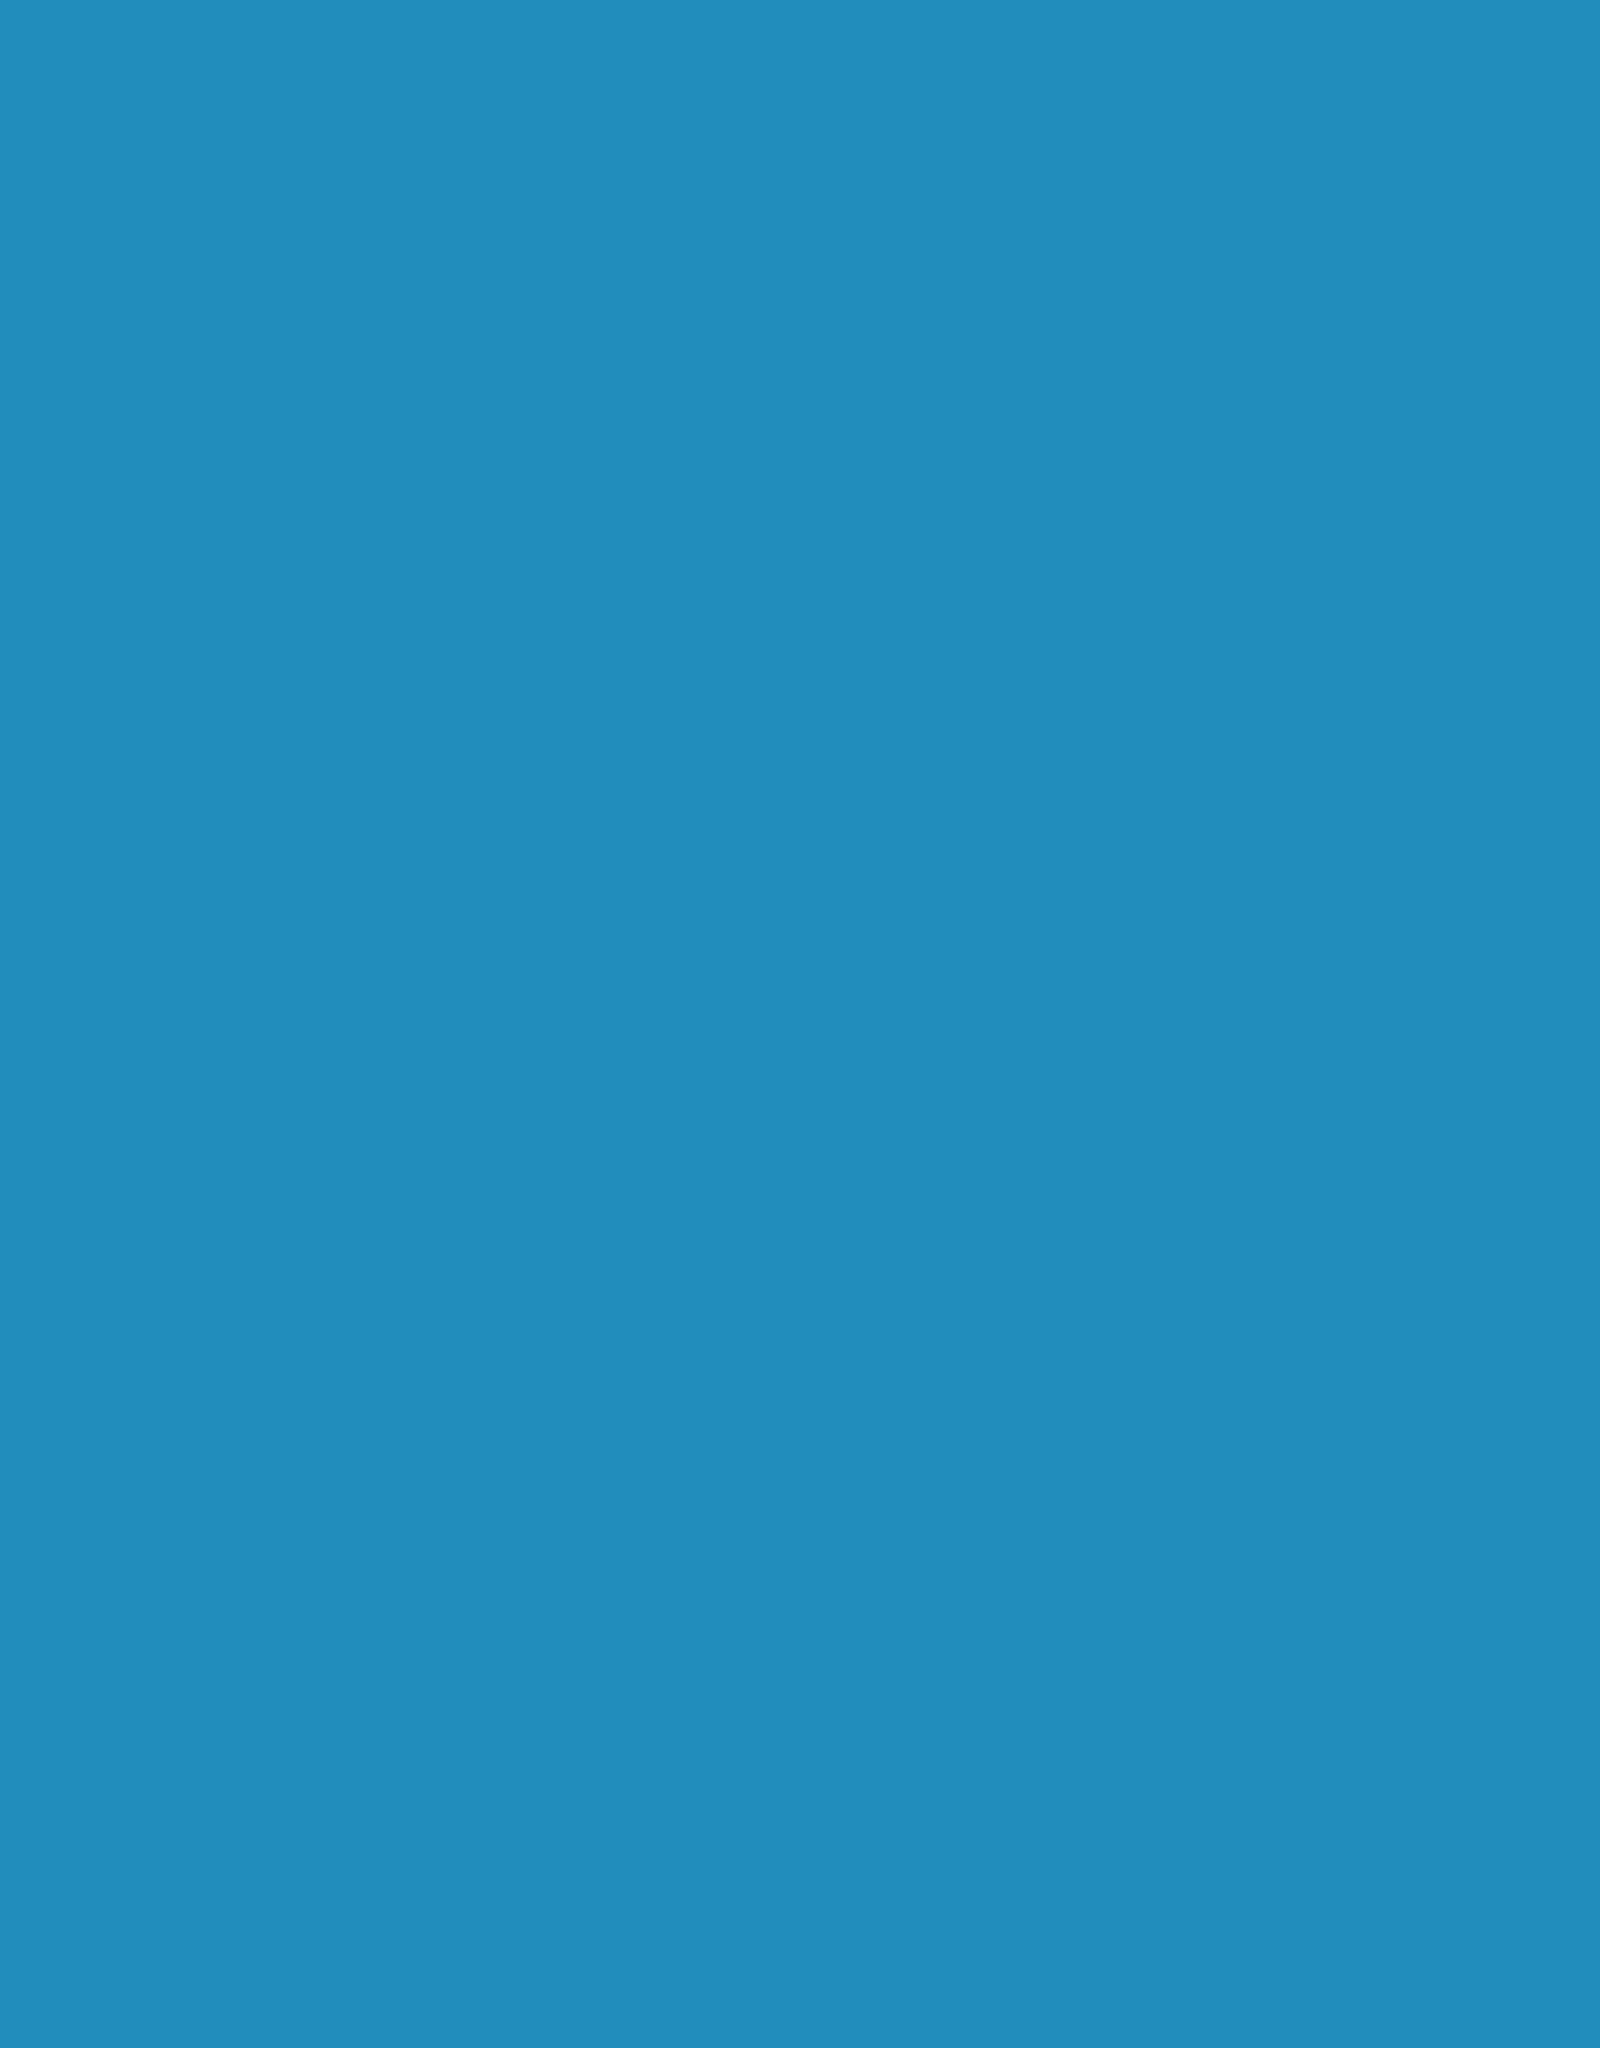 Superior Seamless Superior Seamless 9' Blue Lake #61